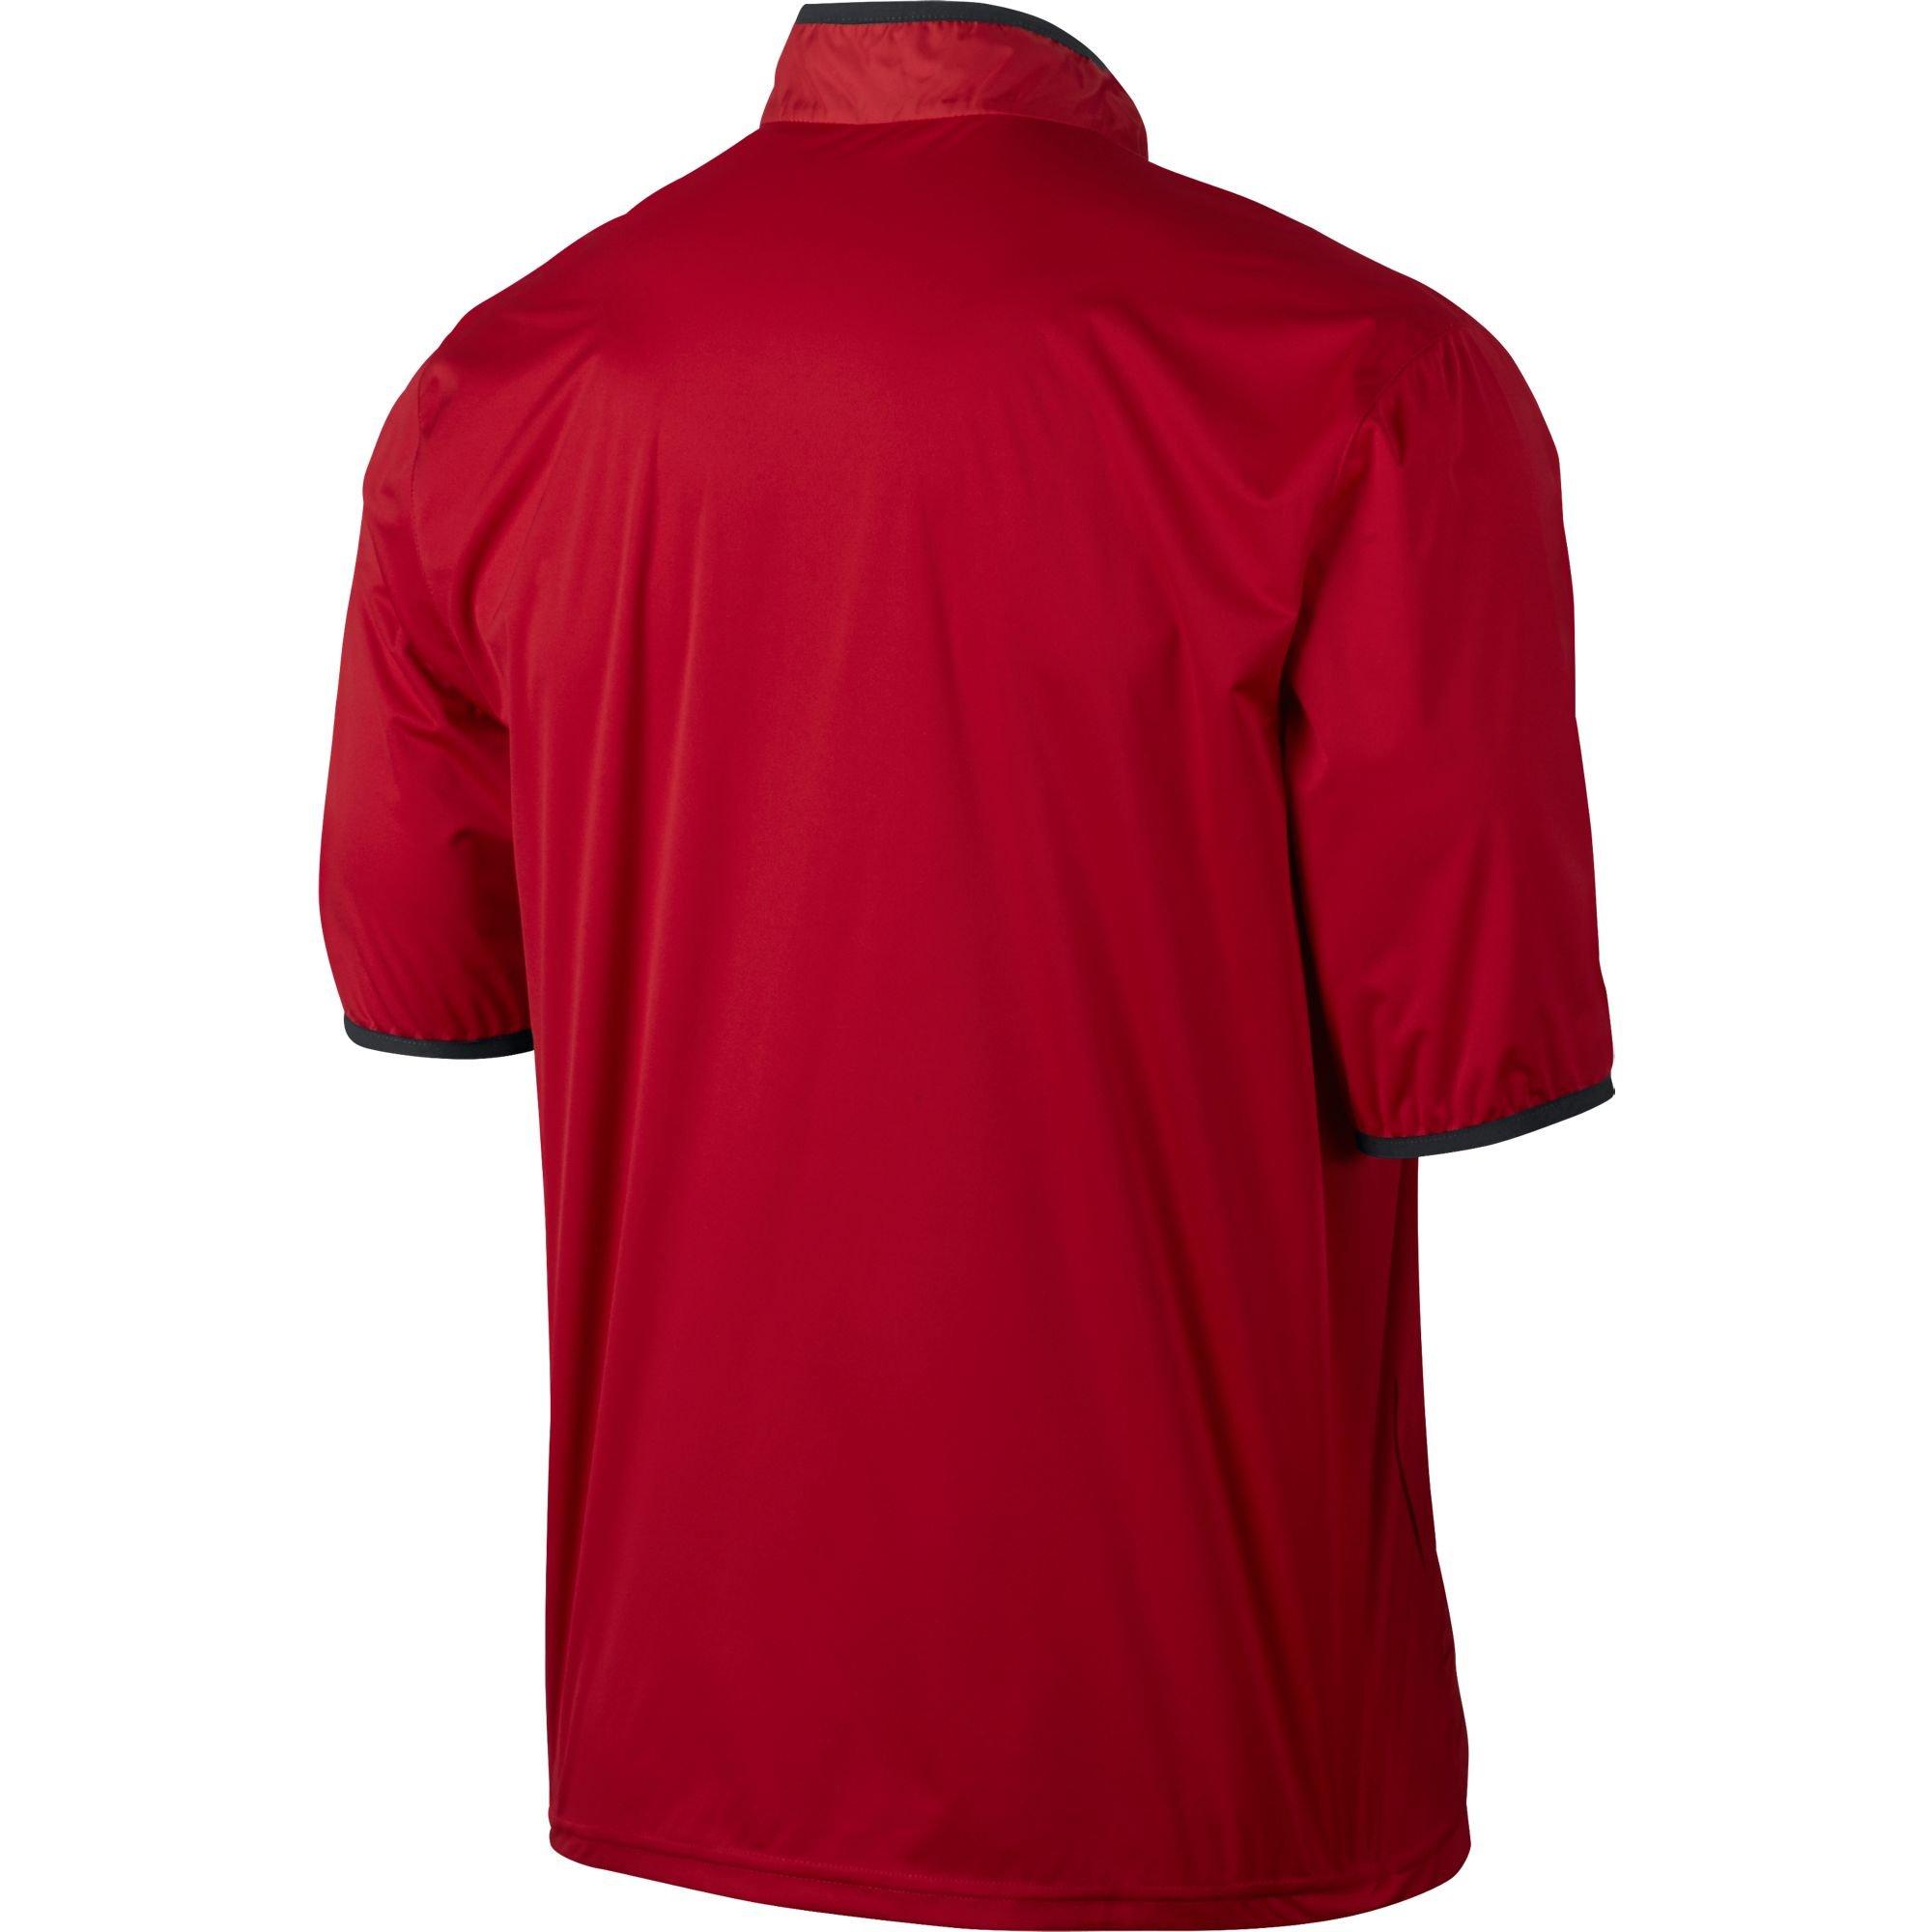 NIKE CLOSEOUT Shield Men's Short Sleeve Golf Jacket (University Red, Medium)